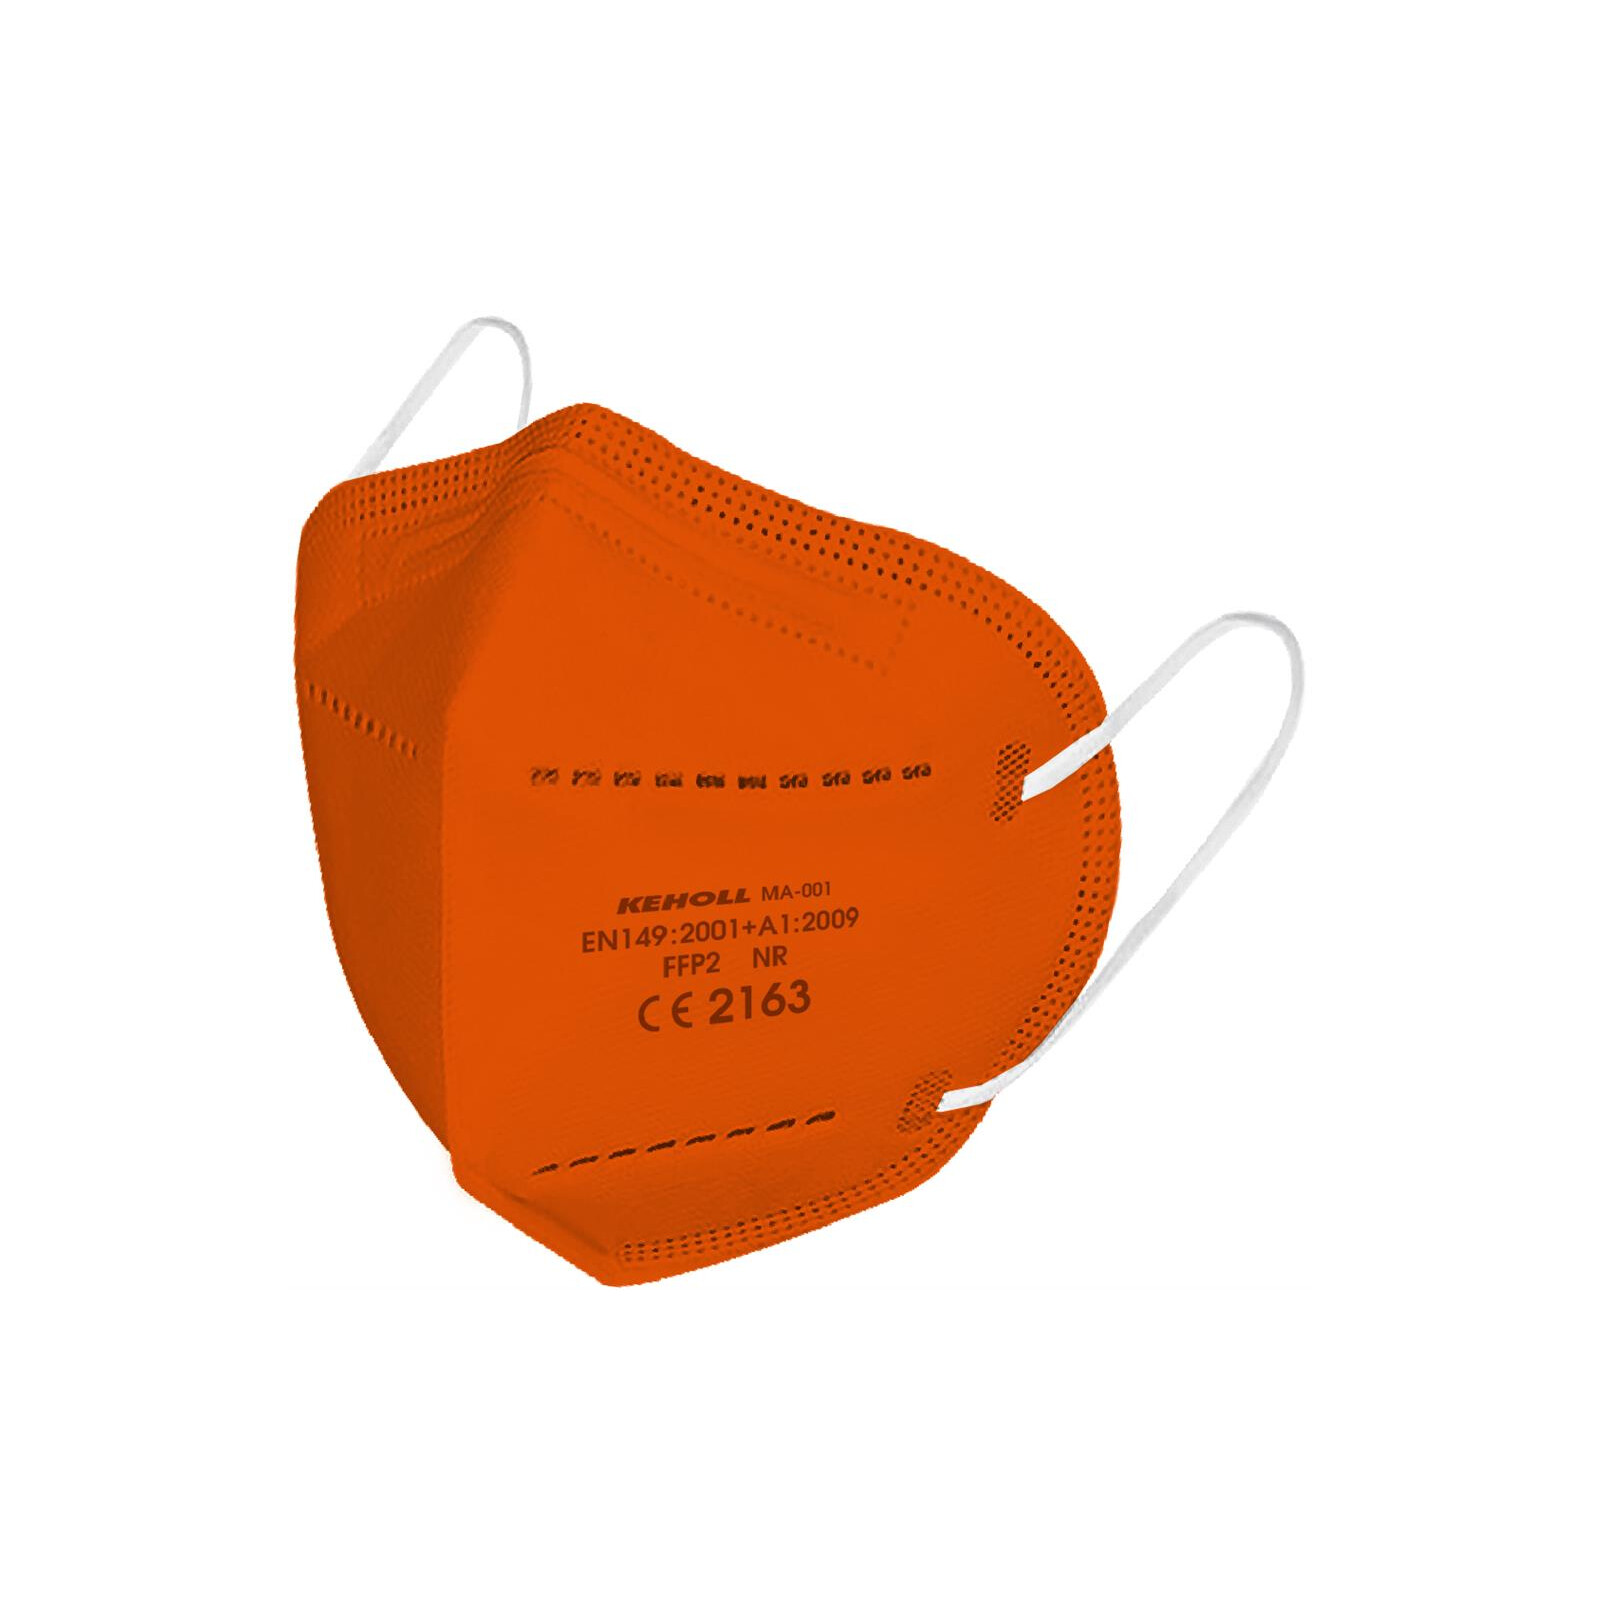 KEHOLL FFP2 MA-001 / Orange